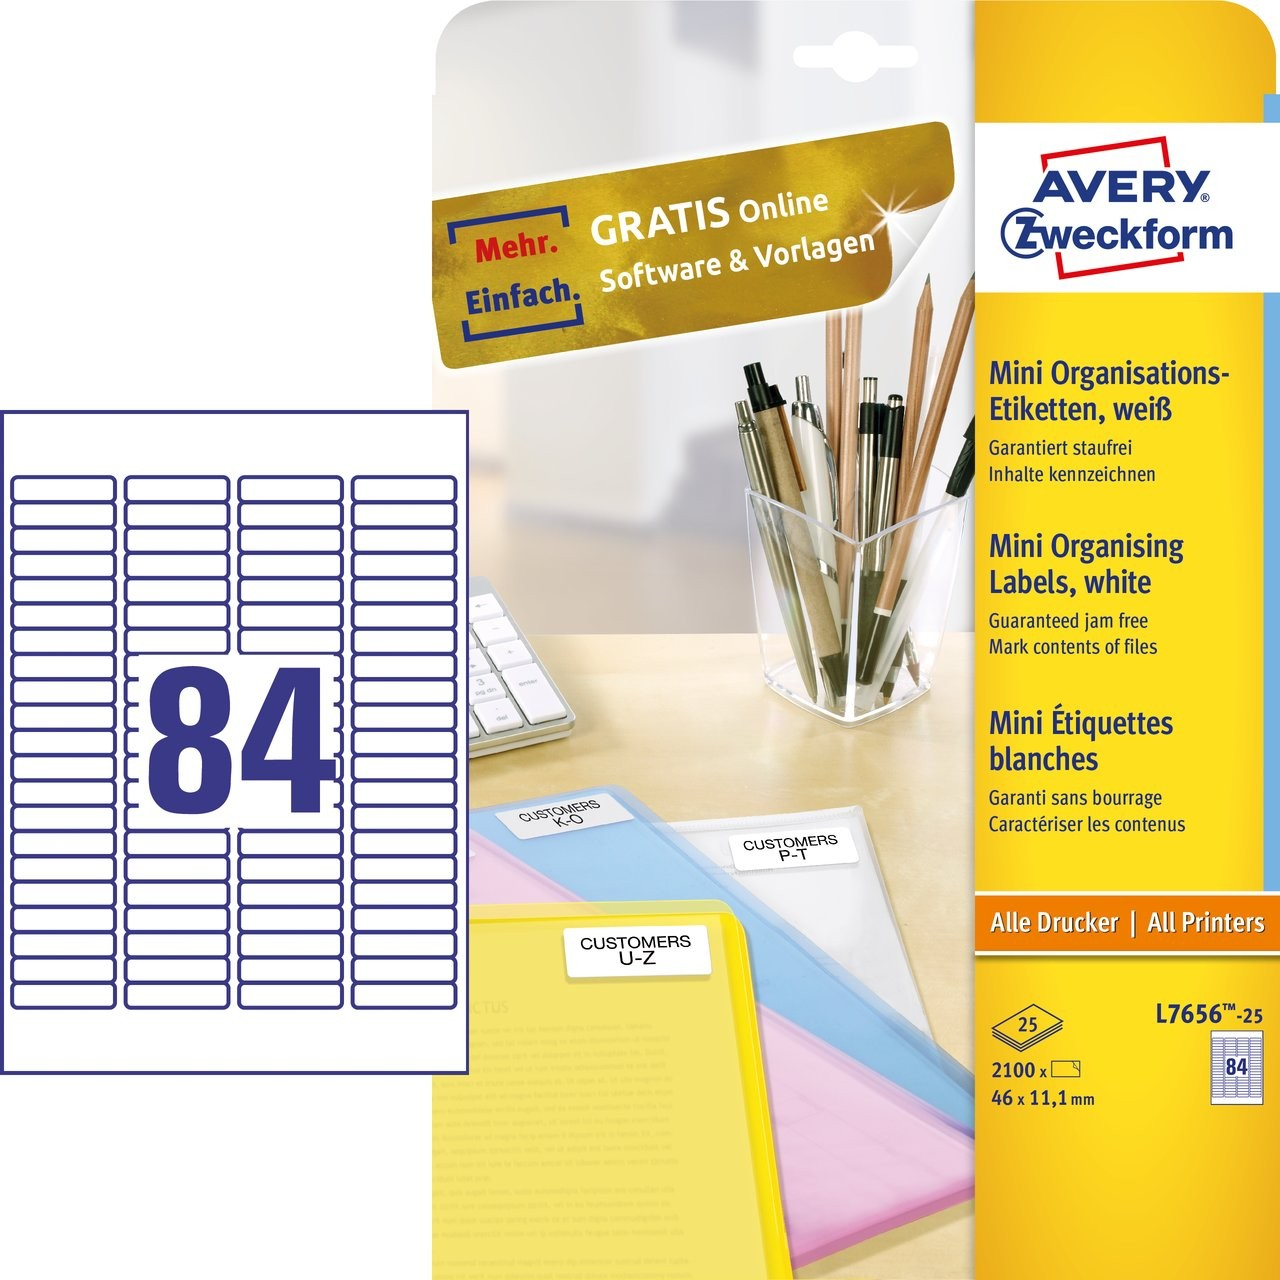 Mini Organising Labels L7656 25 Avery